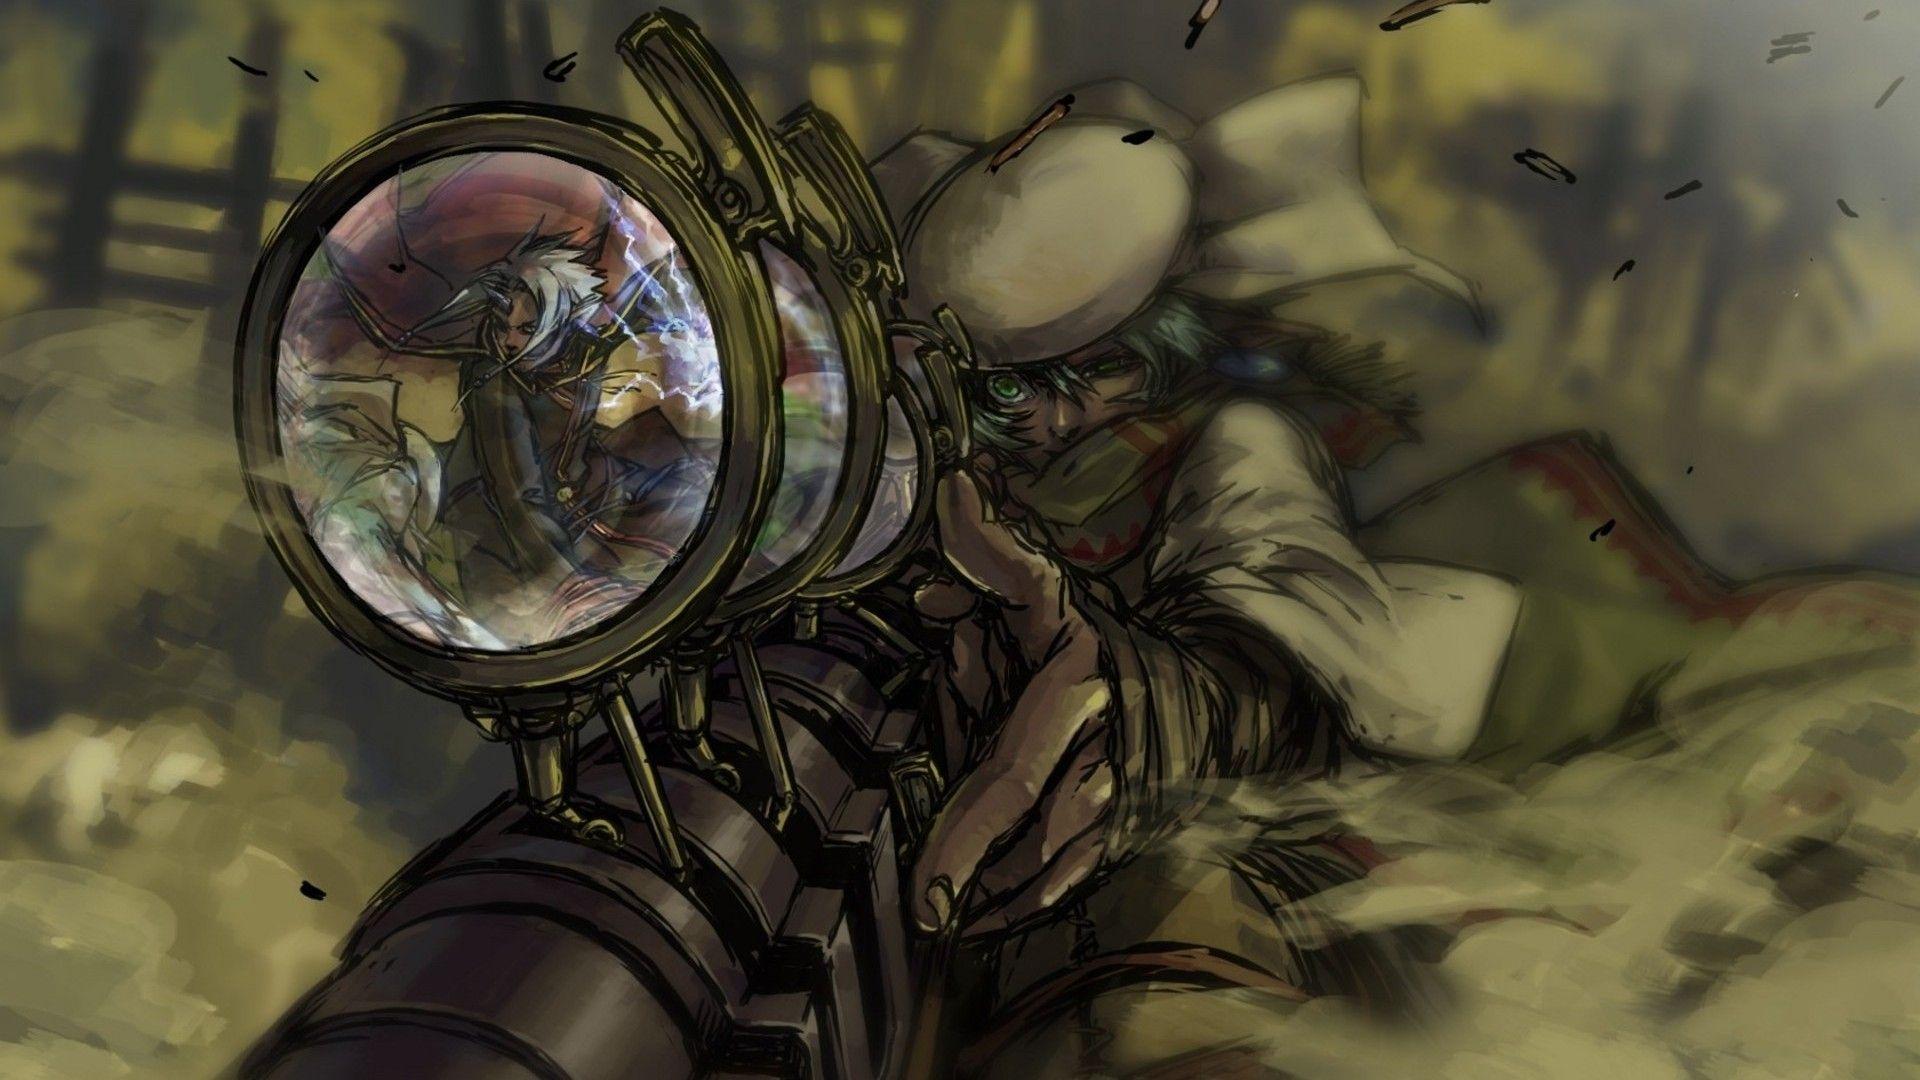 Epic Anime Guns High Resolution Wallpaper HD Wallpapers